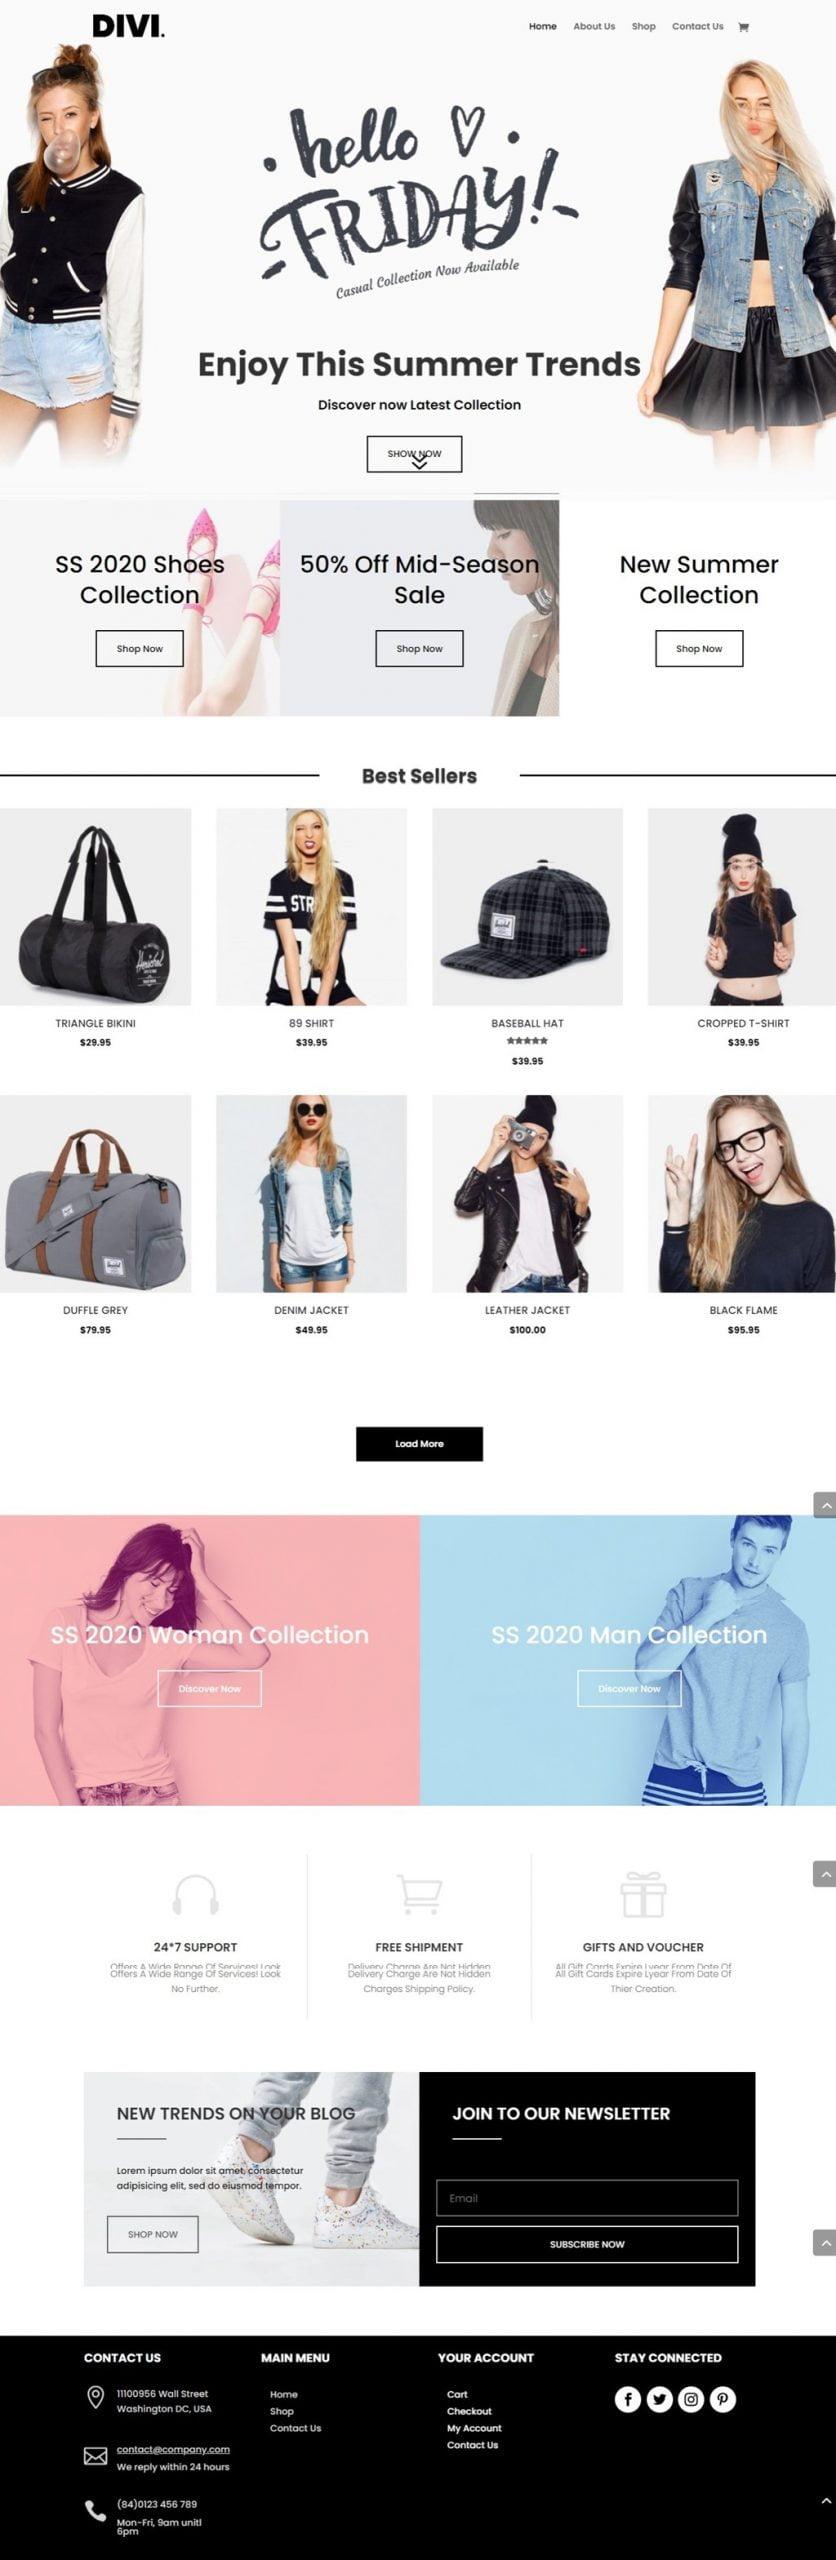 Screenshot of Divi WooCommerce _2 full